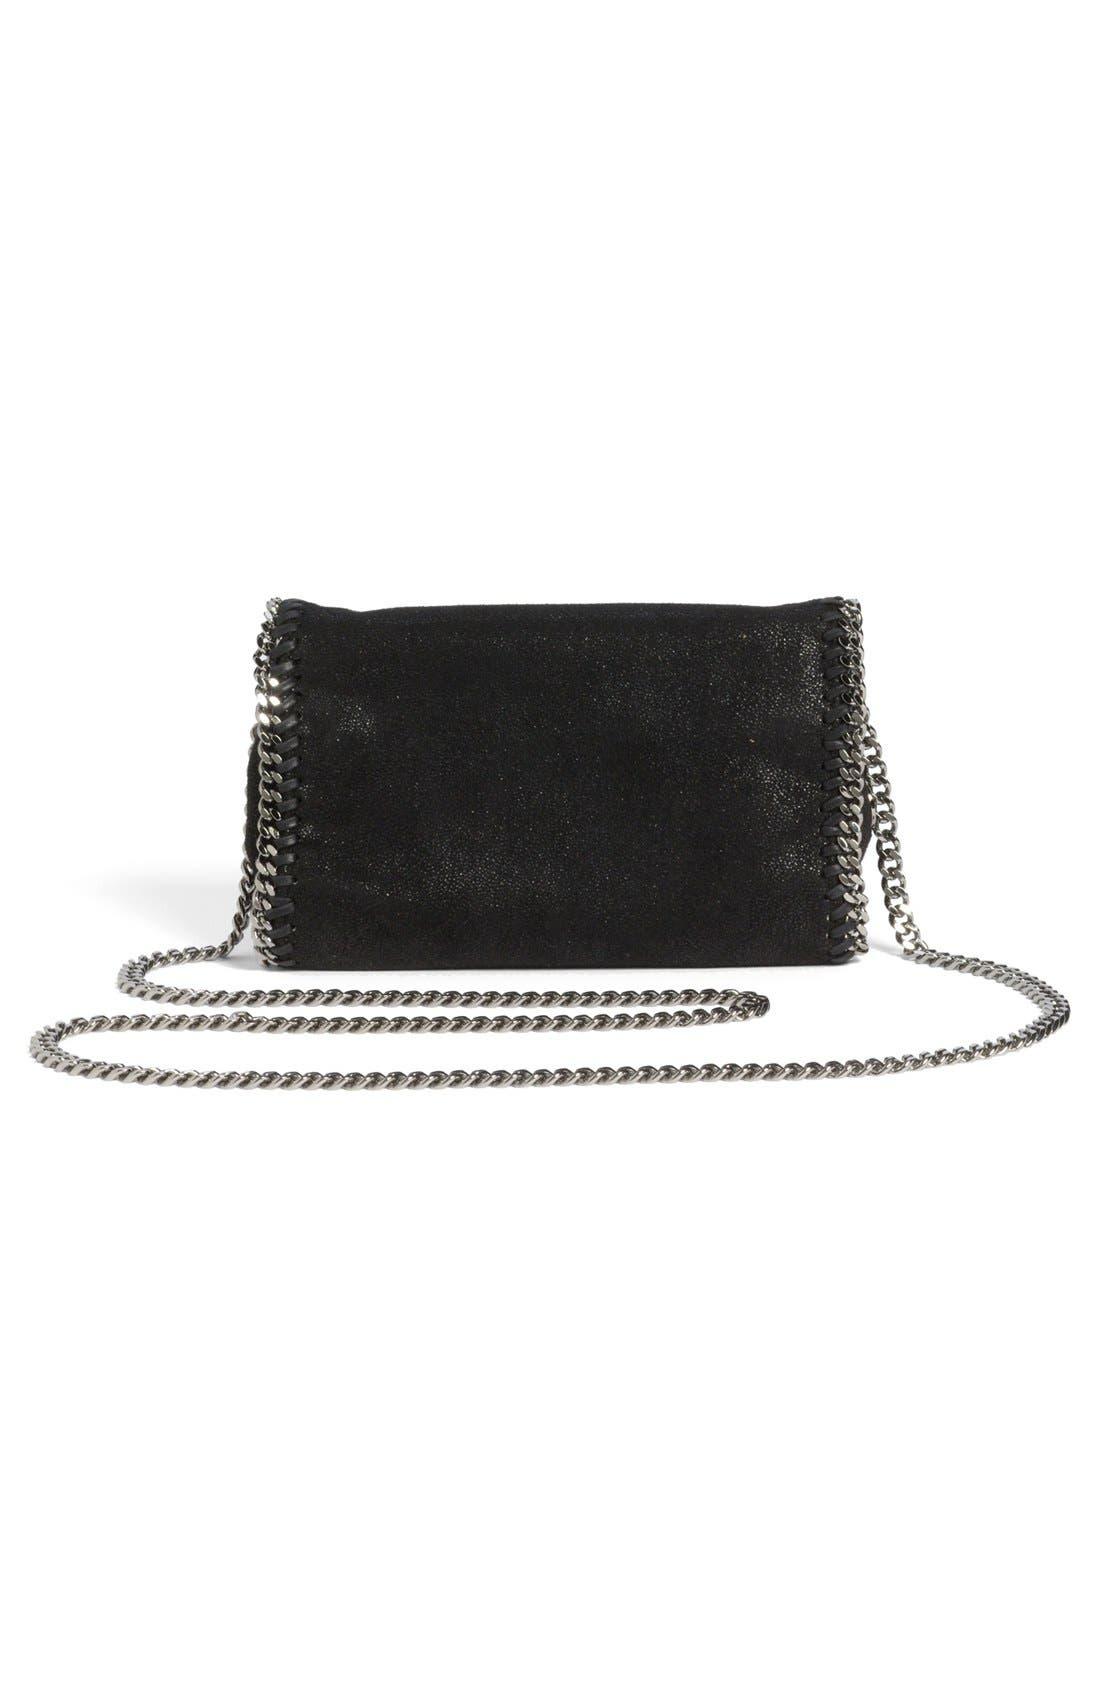 'Falabella - Shaggy Deer' Faux Leather Crossbody Bag,                             Alternate thumbnail 8, color,                             BLACK SLVR HRDWR